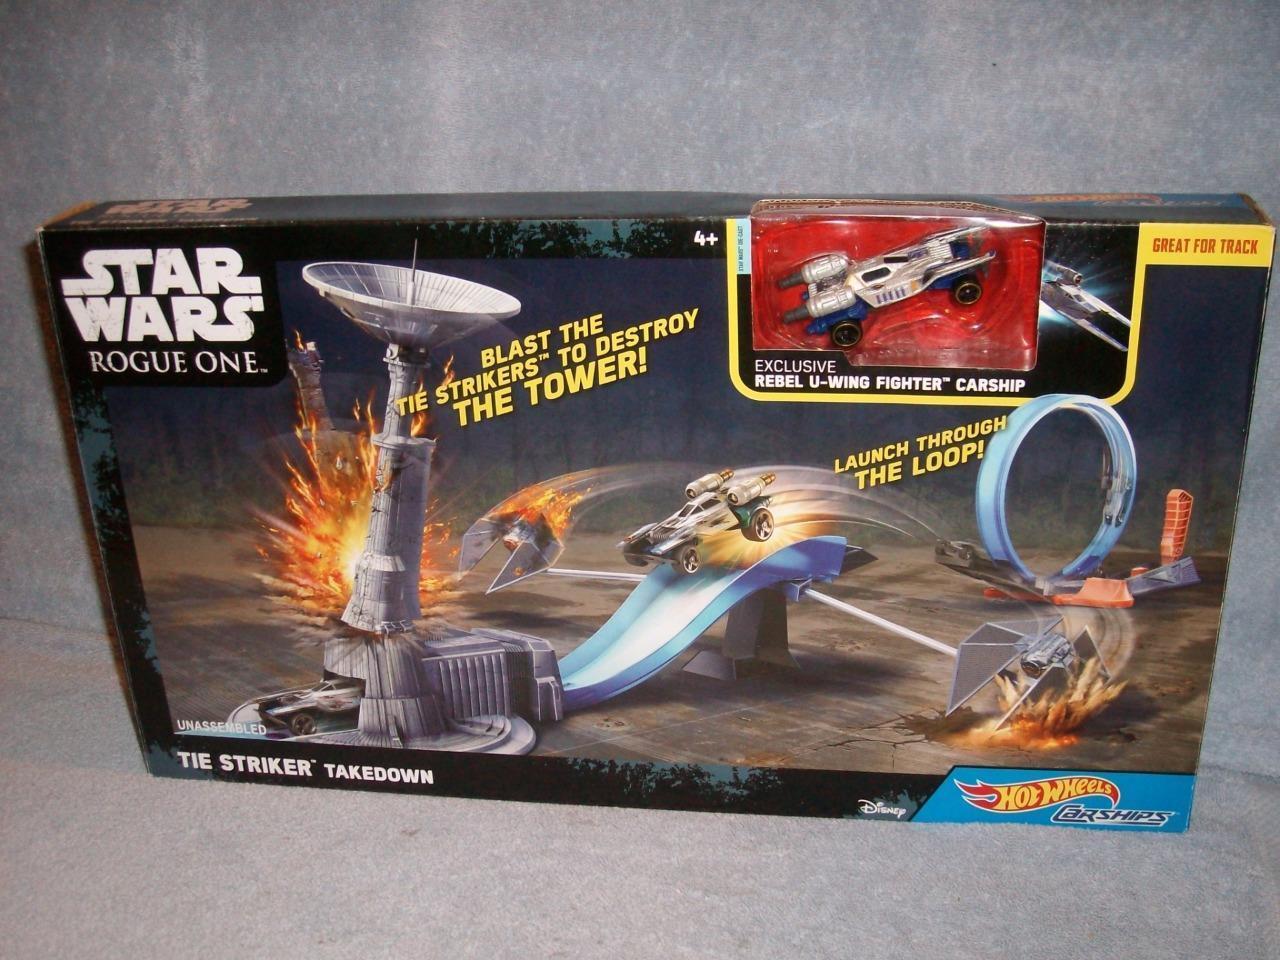 Tie Striker Takedown U-Wing Star Wars Rogue One Hot Wheels Carships 2016 New HTF